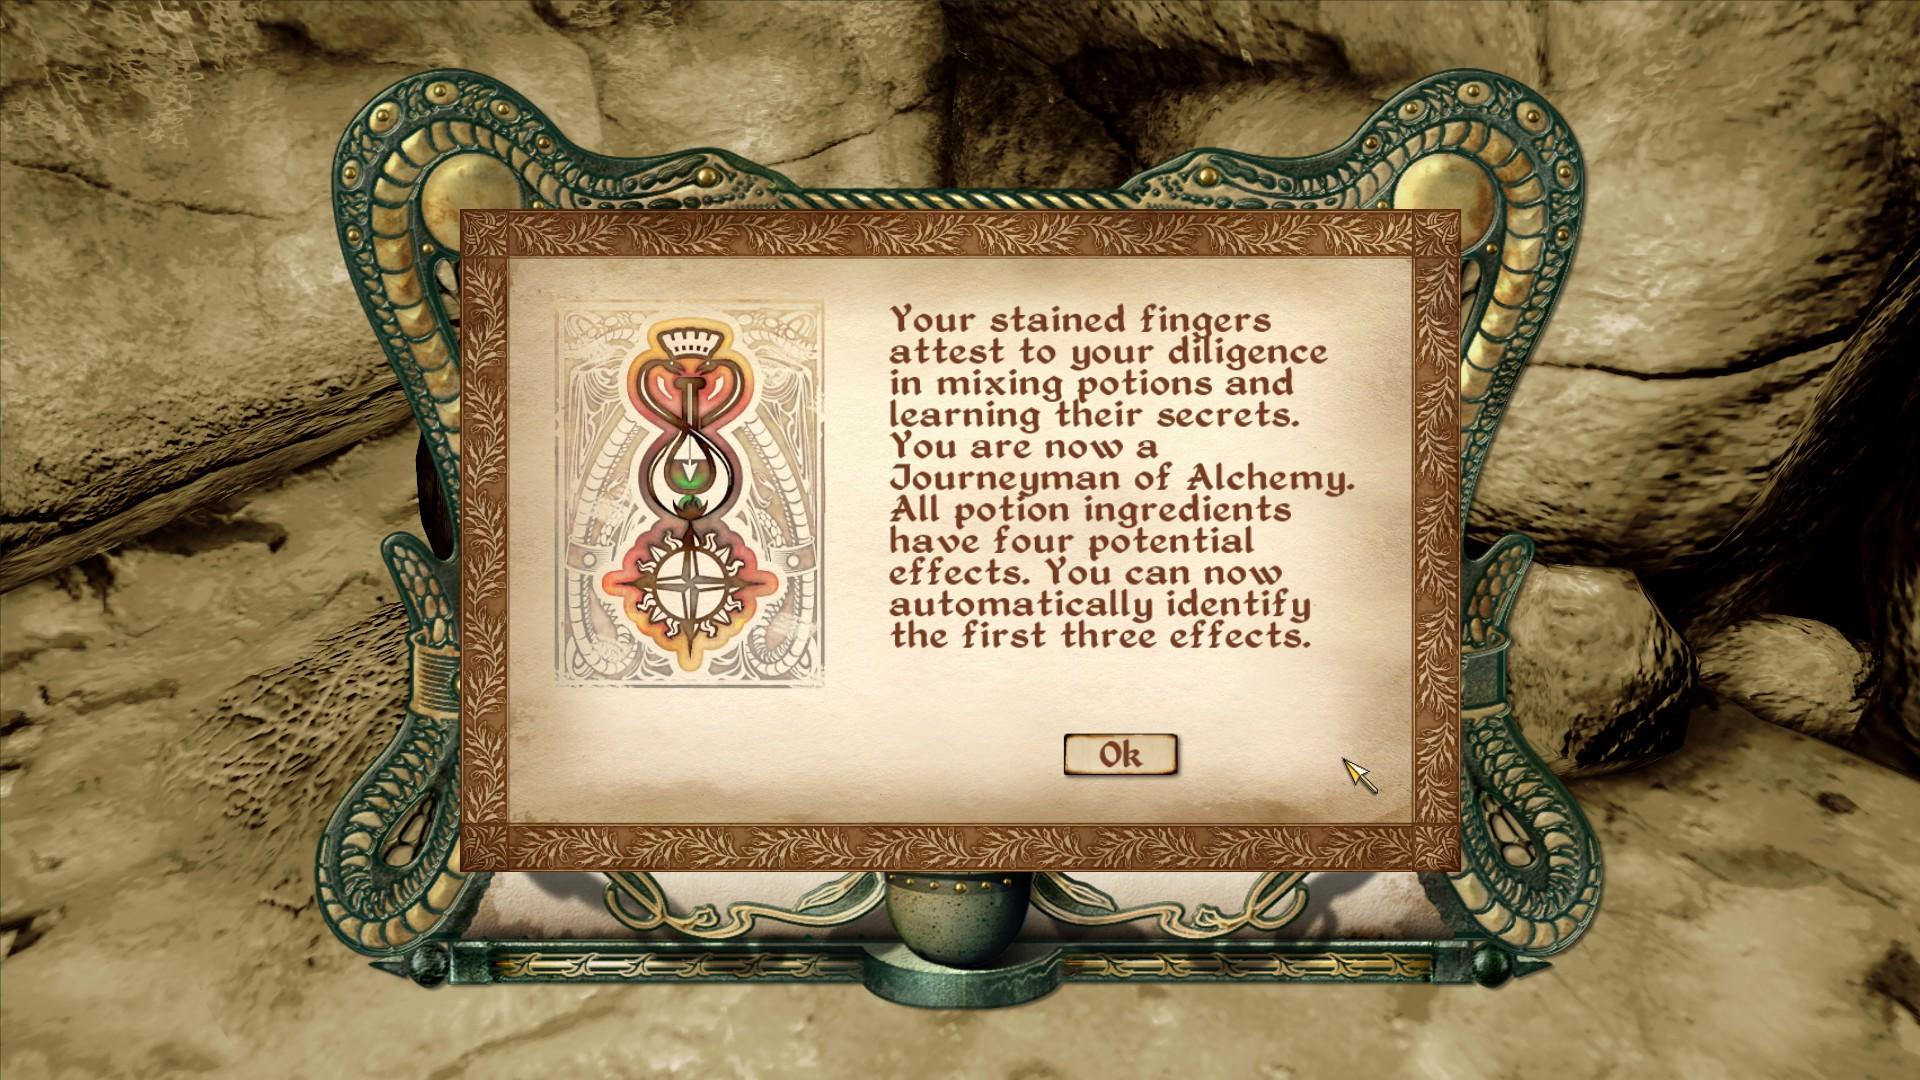 The Elder Scrolls IV: Oblivion GOTY Edition - Lutris